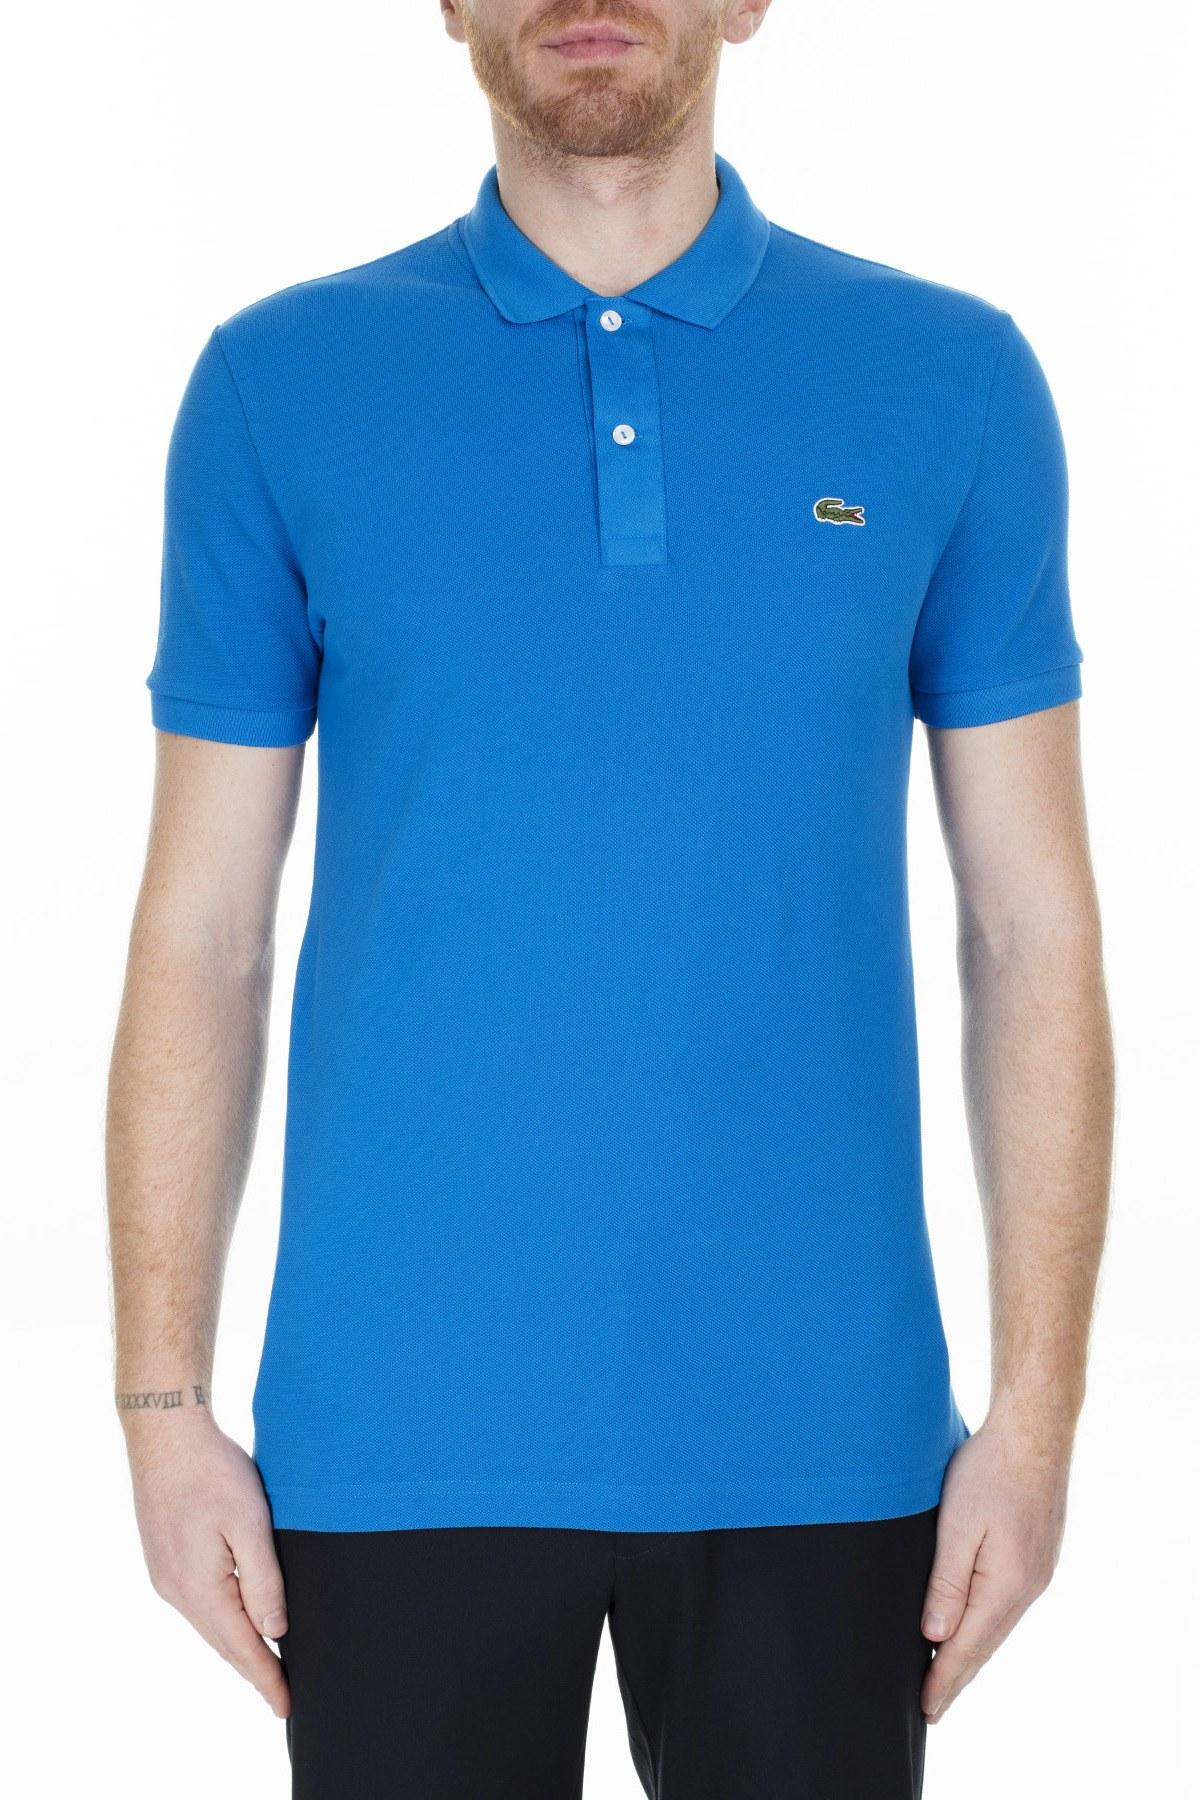 Lacoste Slim Fit T Shirt Erkek Polo PH4012 L61 SAKS